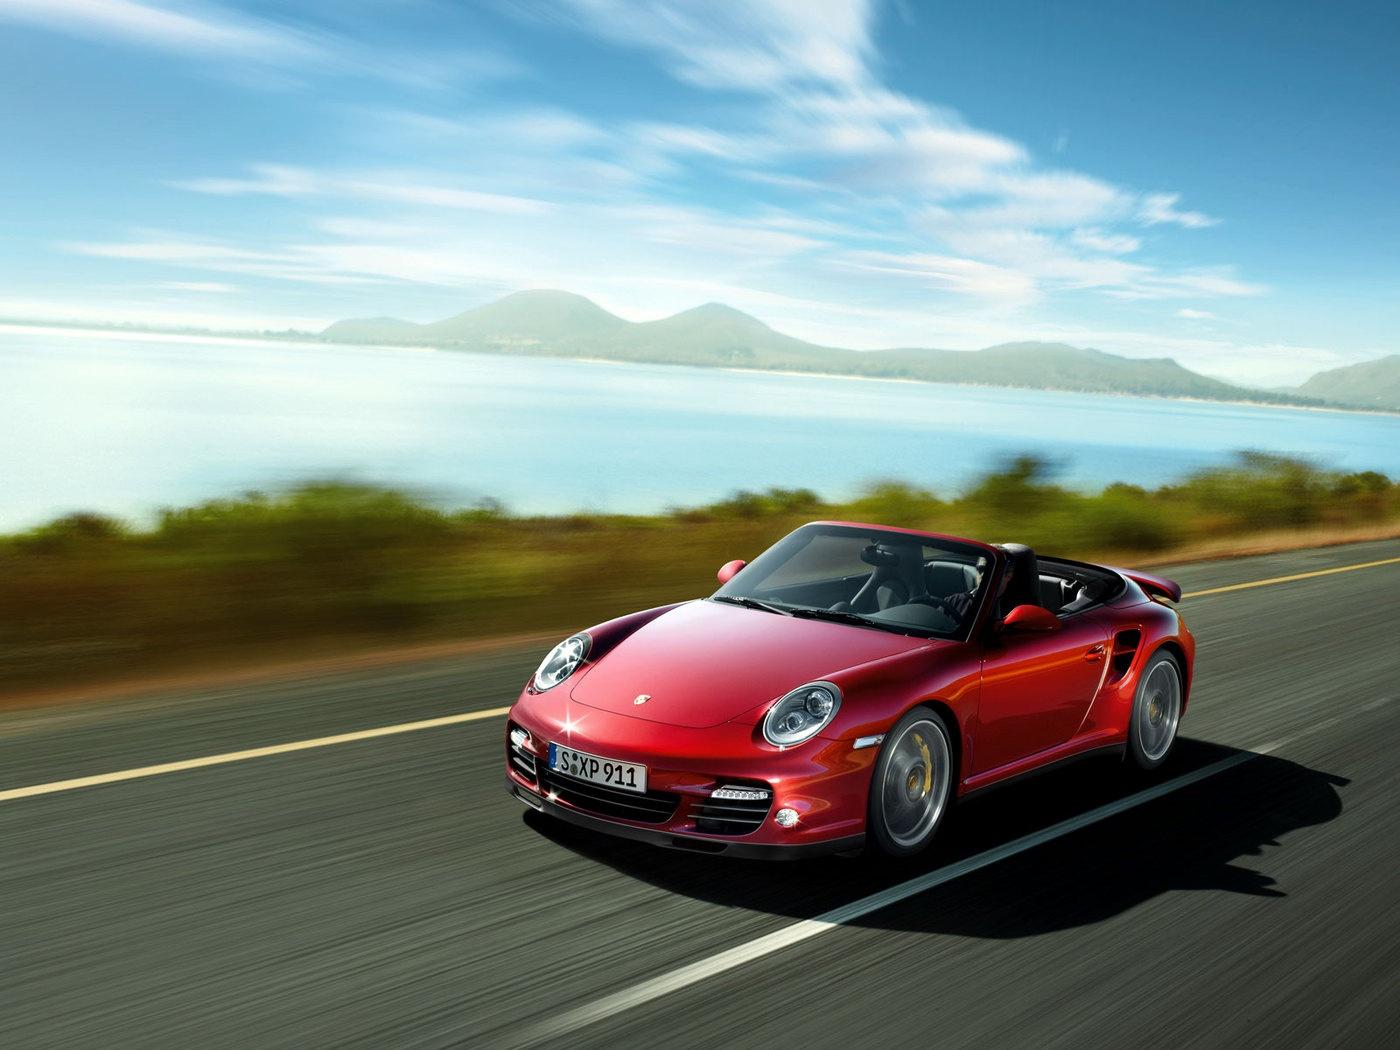 Porsche 911 Turbo Cabrio Wallpapers HD Wallpapers 1400x1050